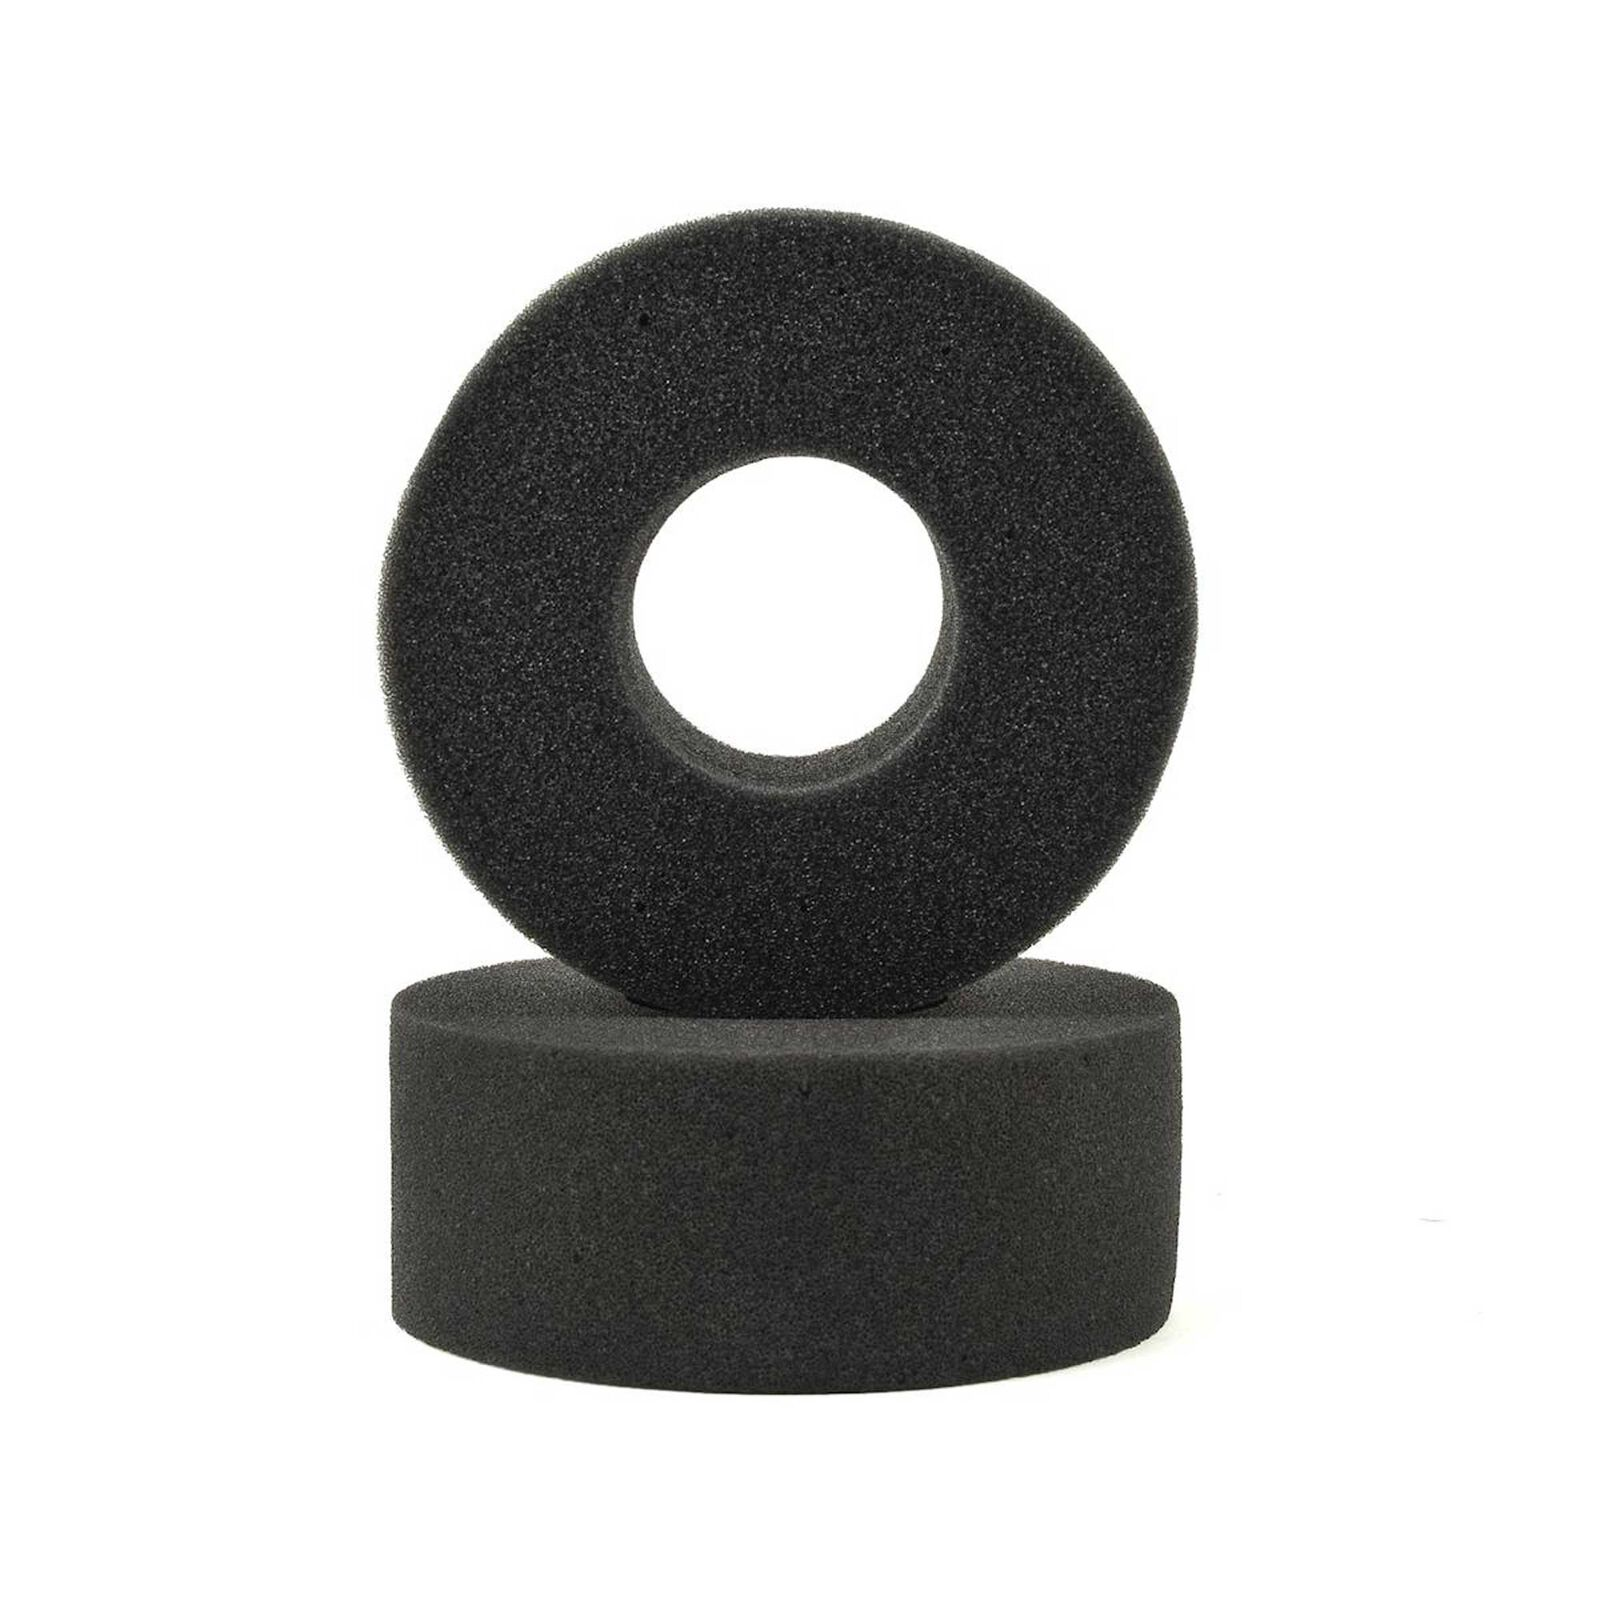 Dirty Richard Single Stage Foam Inserts Medium 133x54.5x53 (2)